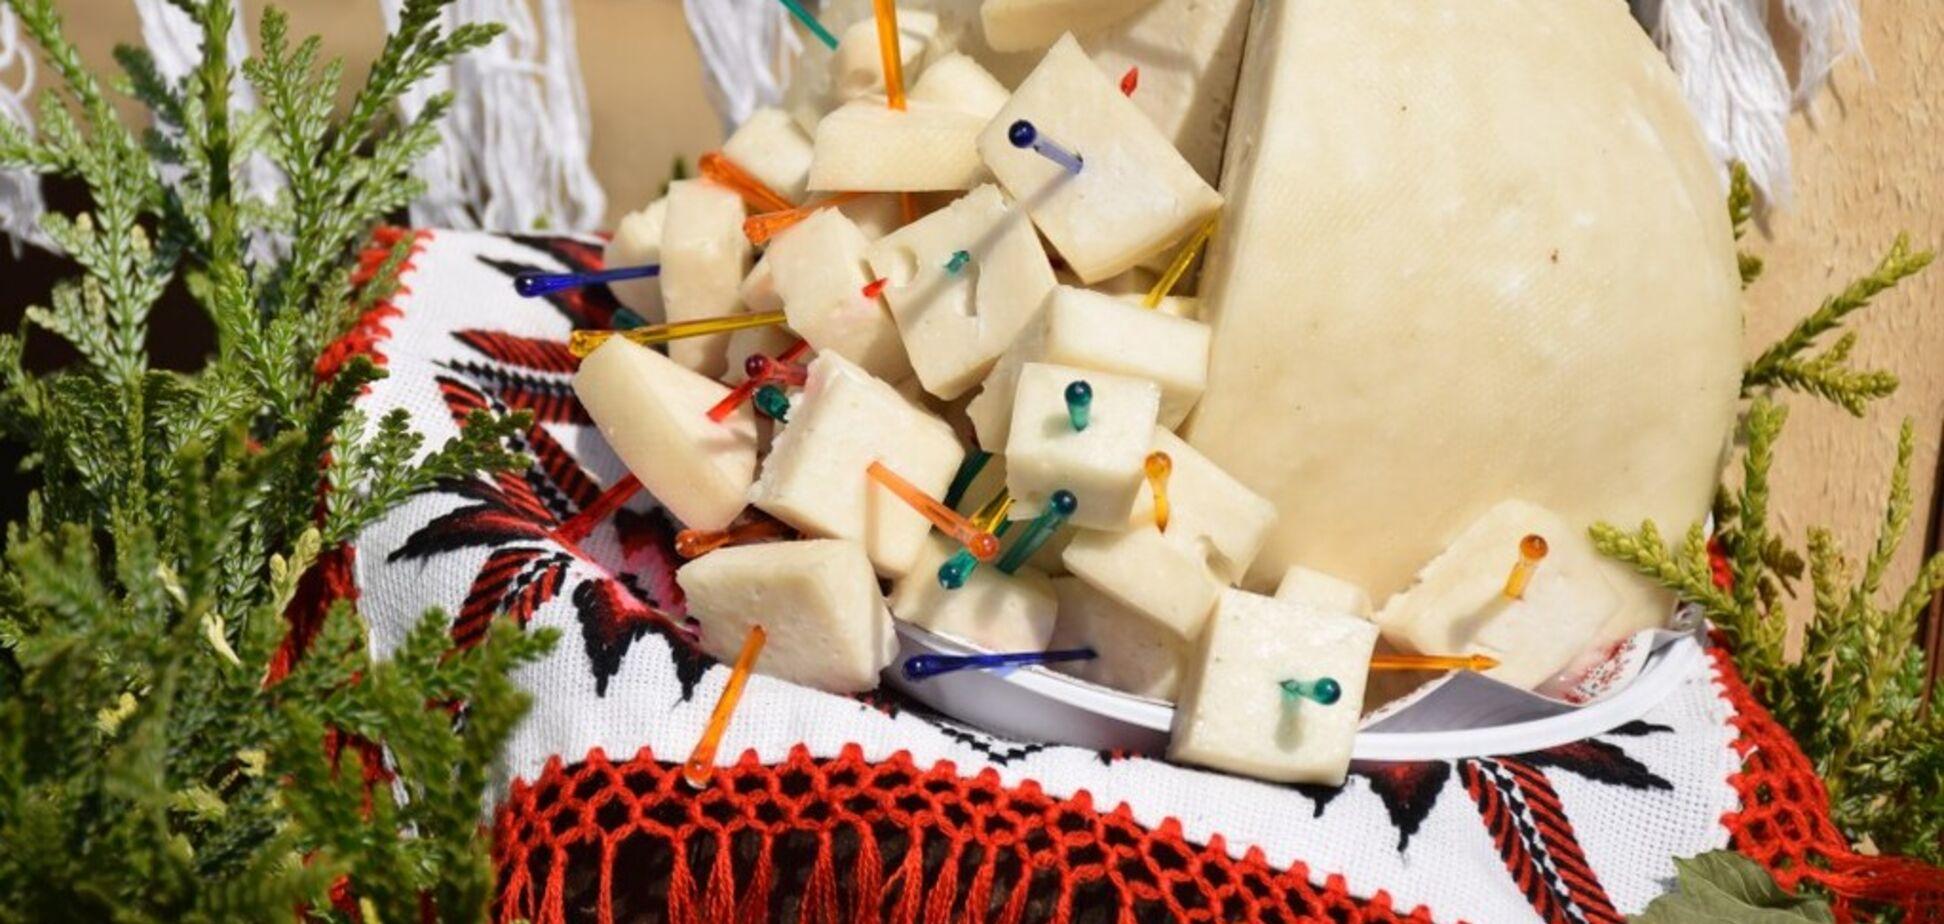 В Україні дали захищену назву основним продуктам